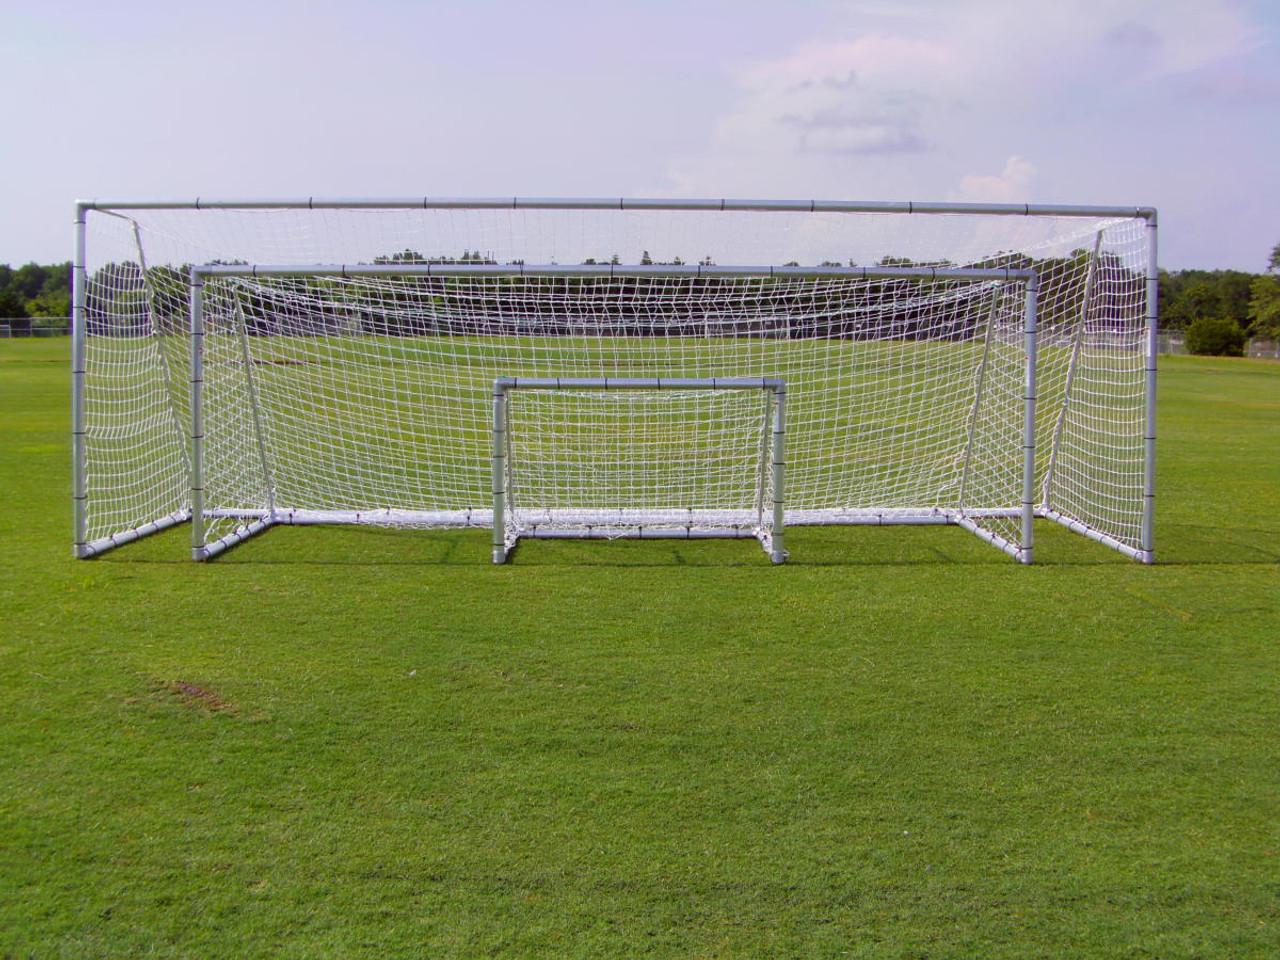 Pevo Soccer Goals 6.5 x 18'_3